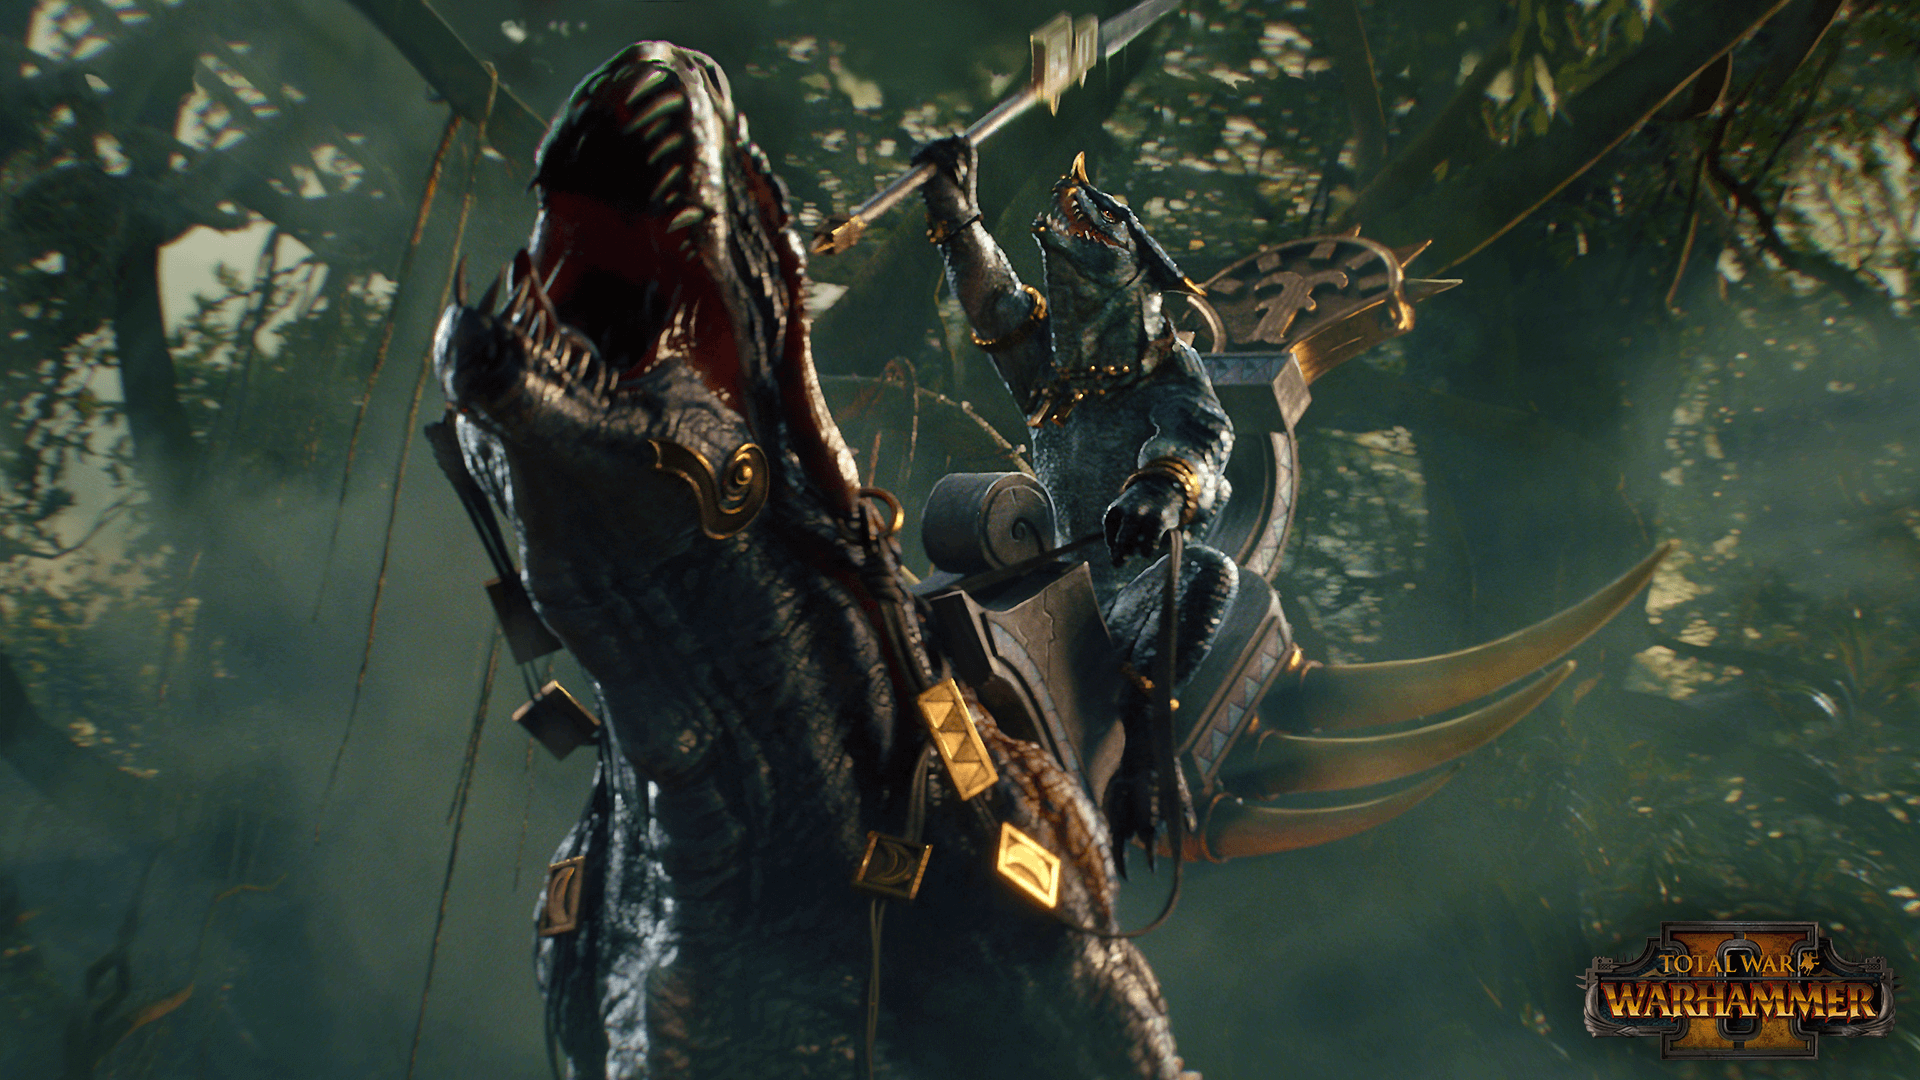 Foto de Total War Warhammer II ganha seu primeiro trailer da campanha